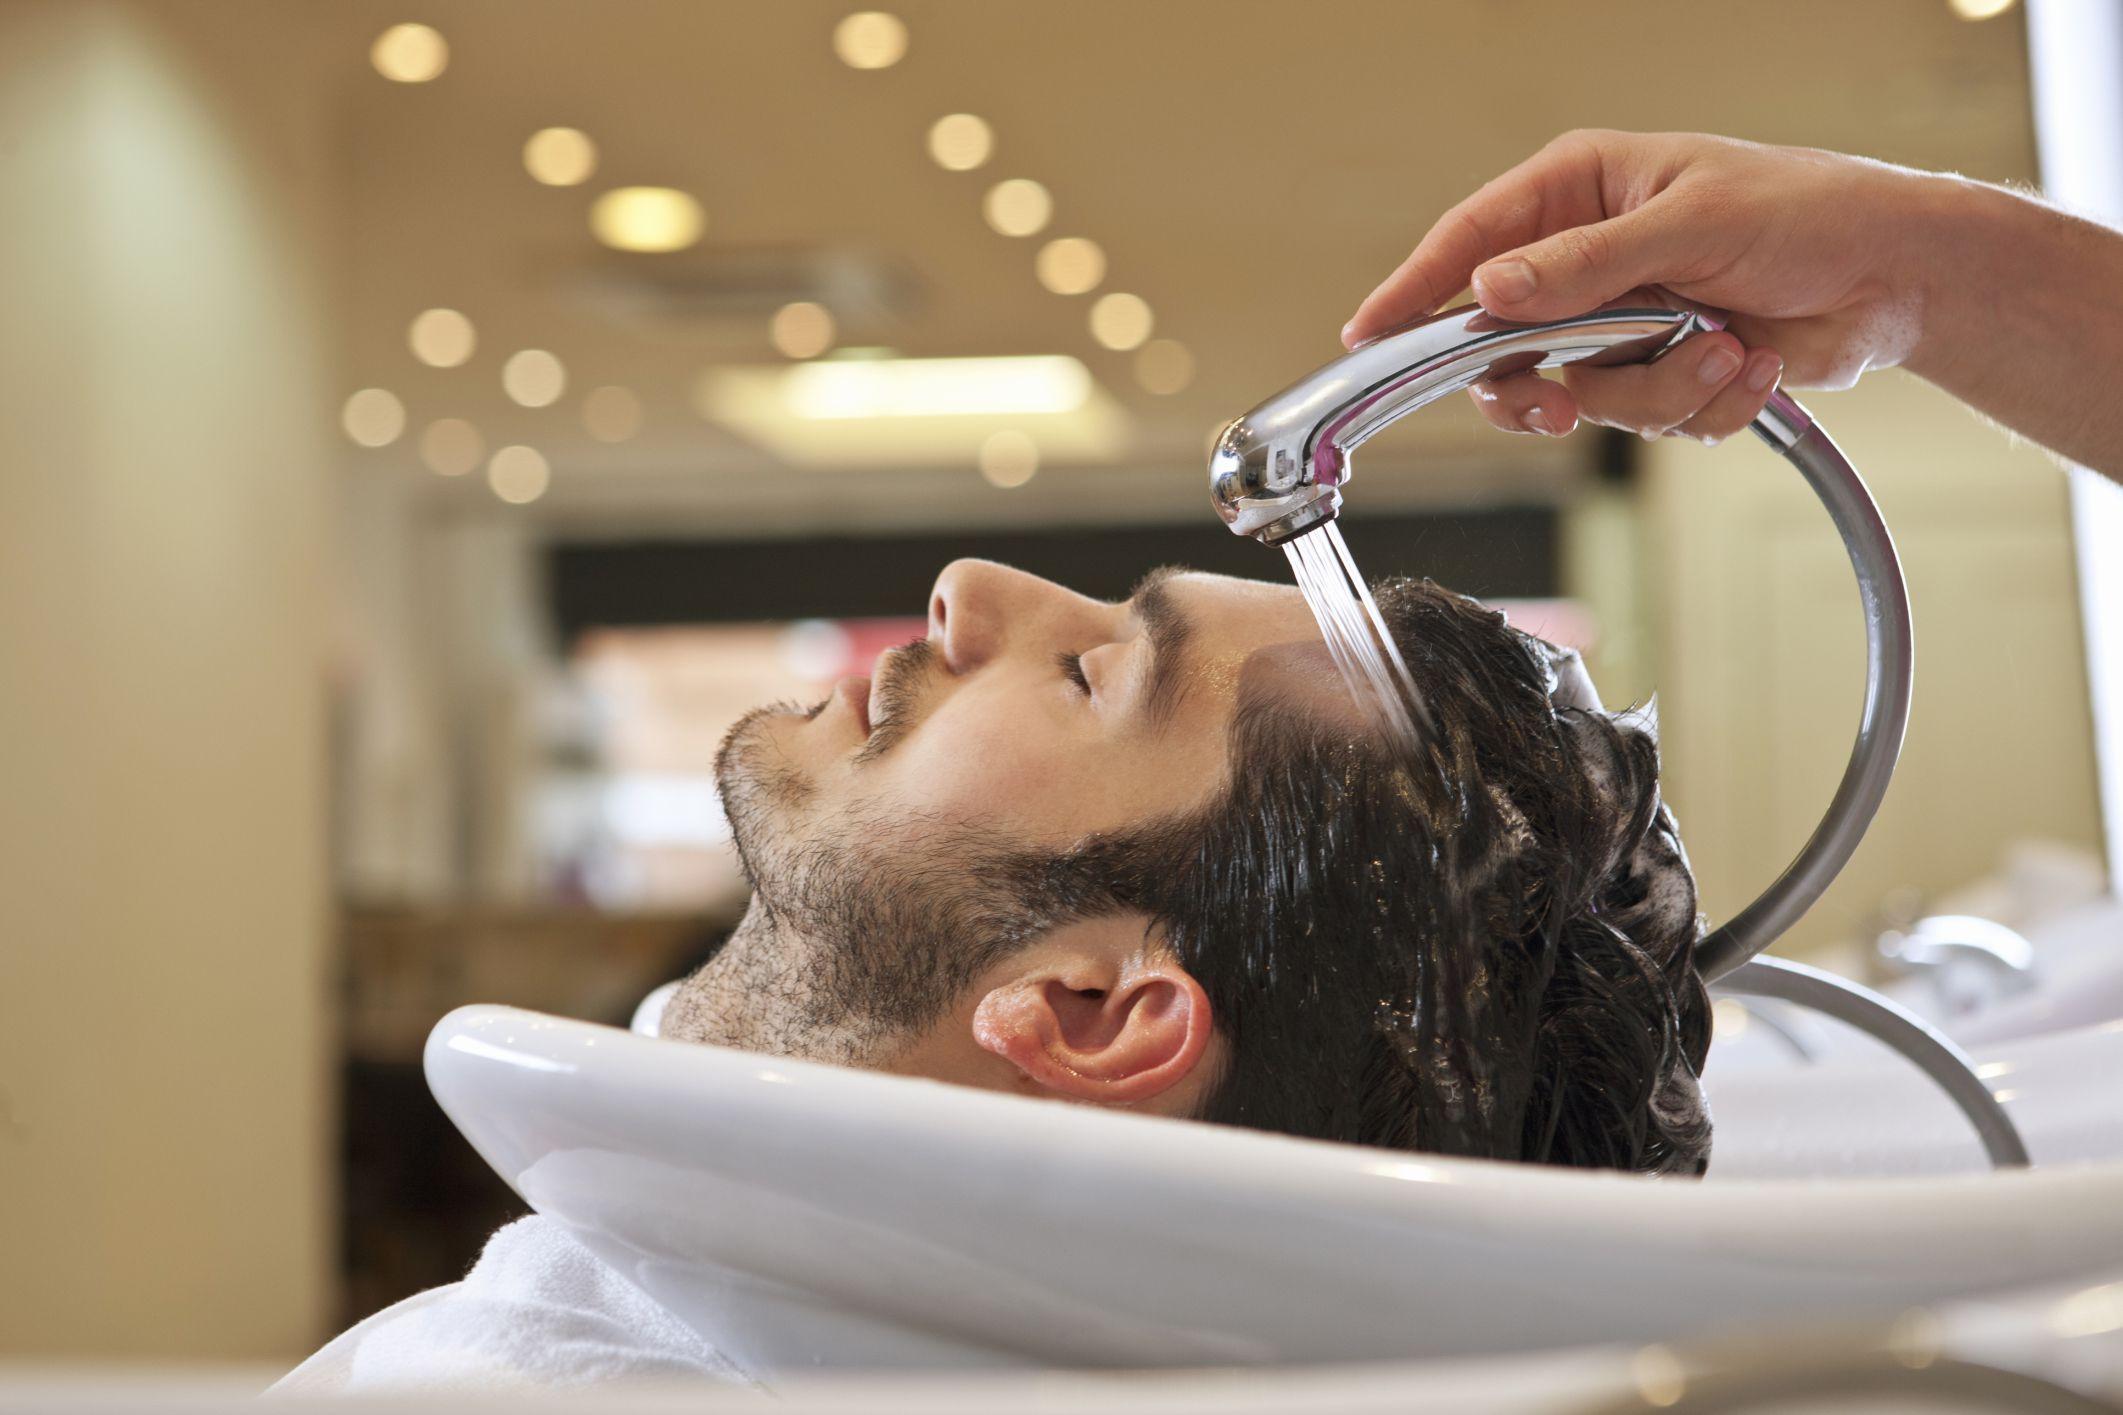 Keeping A Healthy Looking Head Of Hair